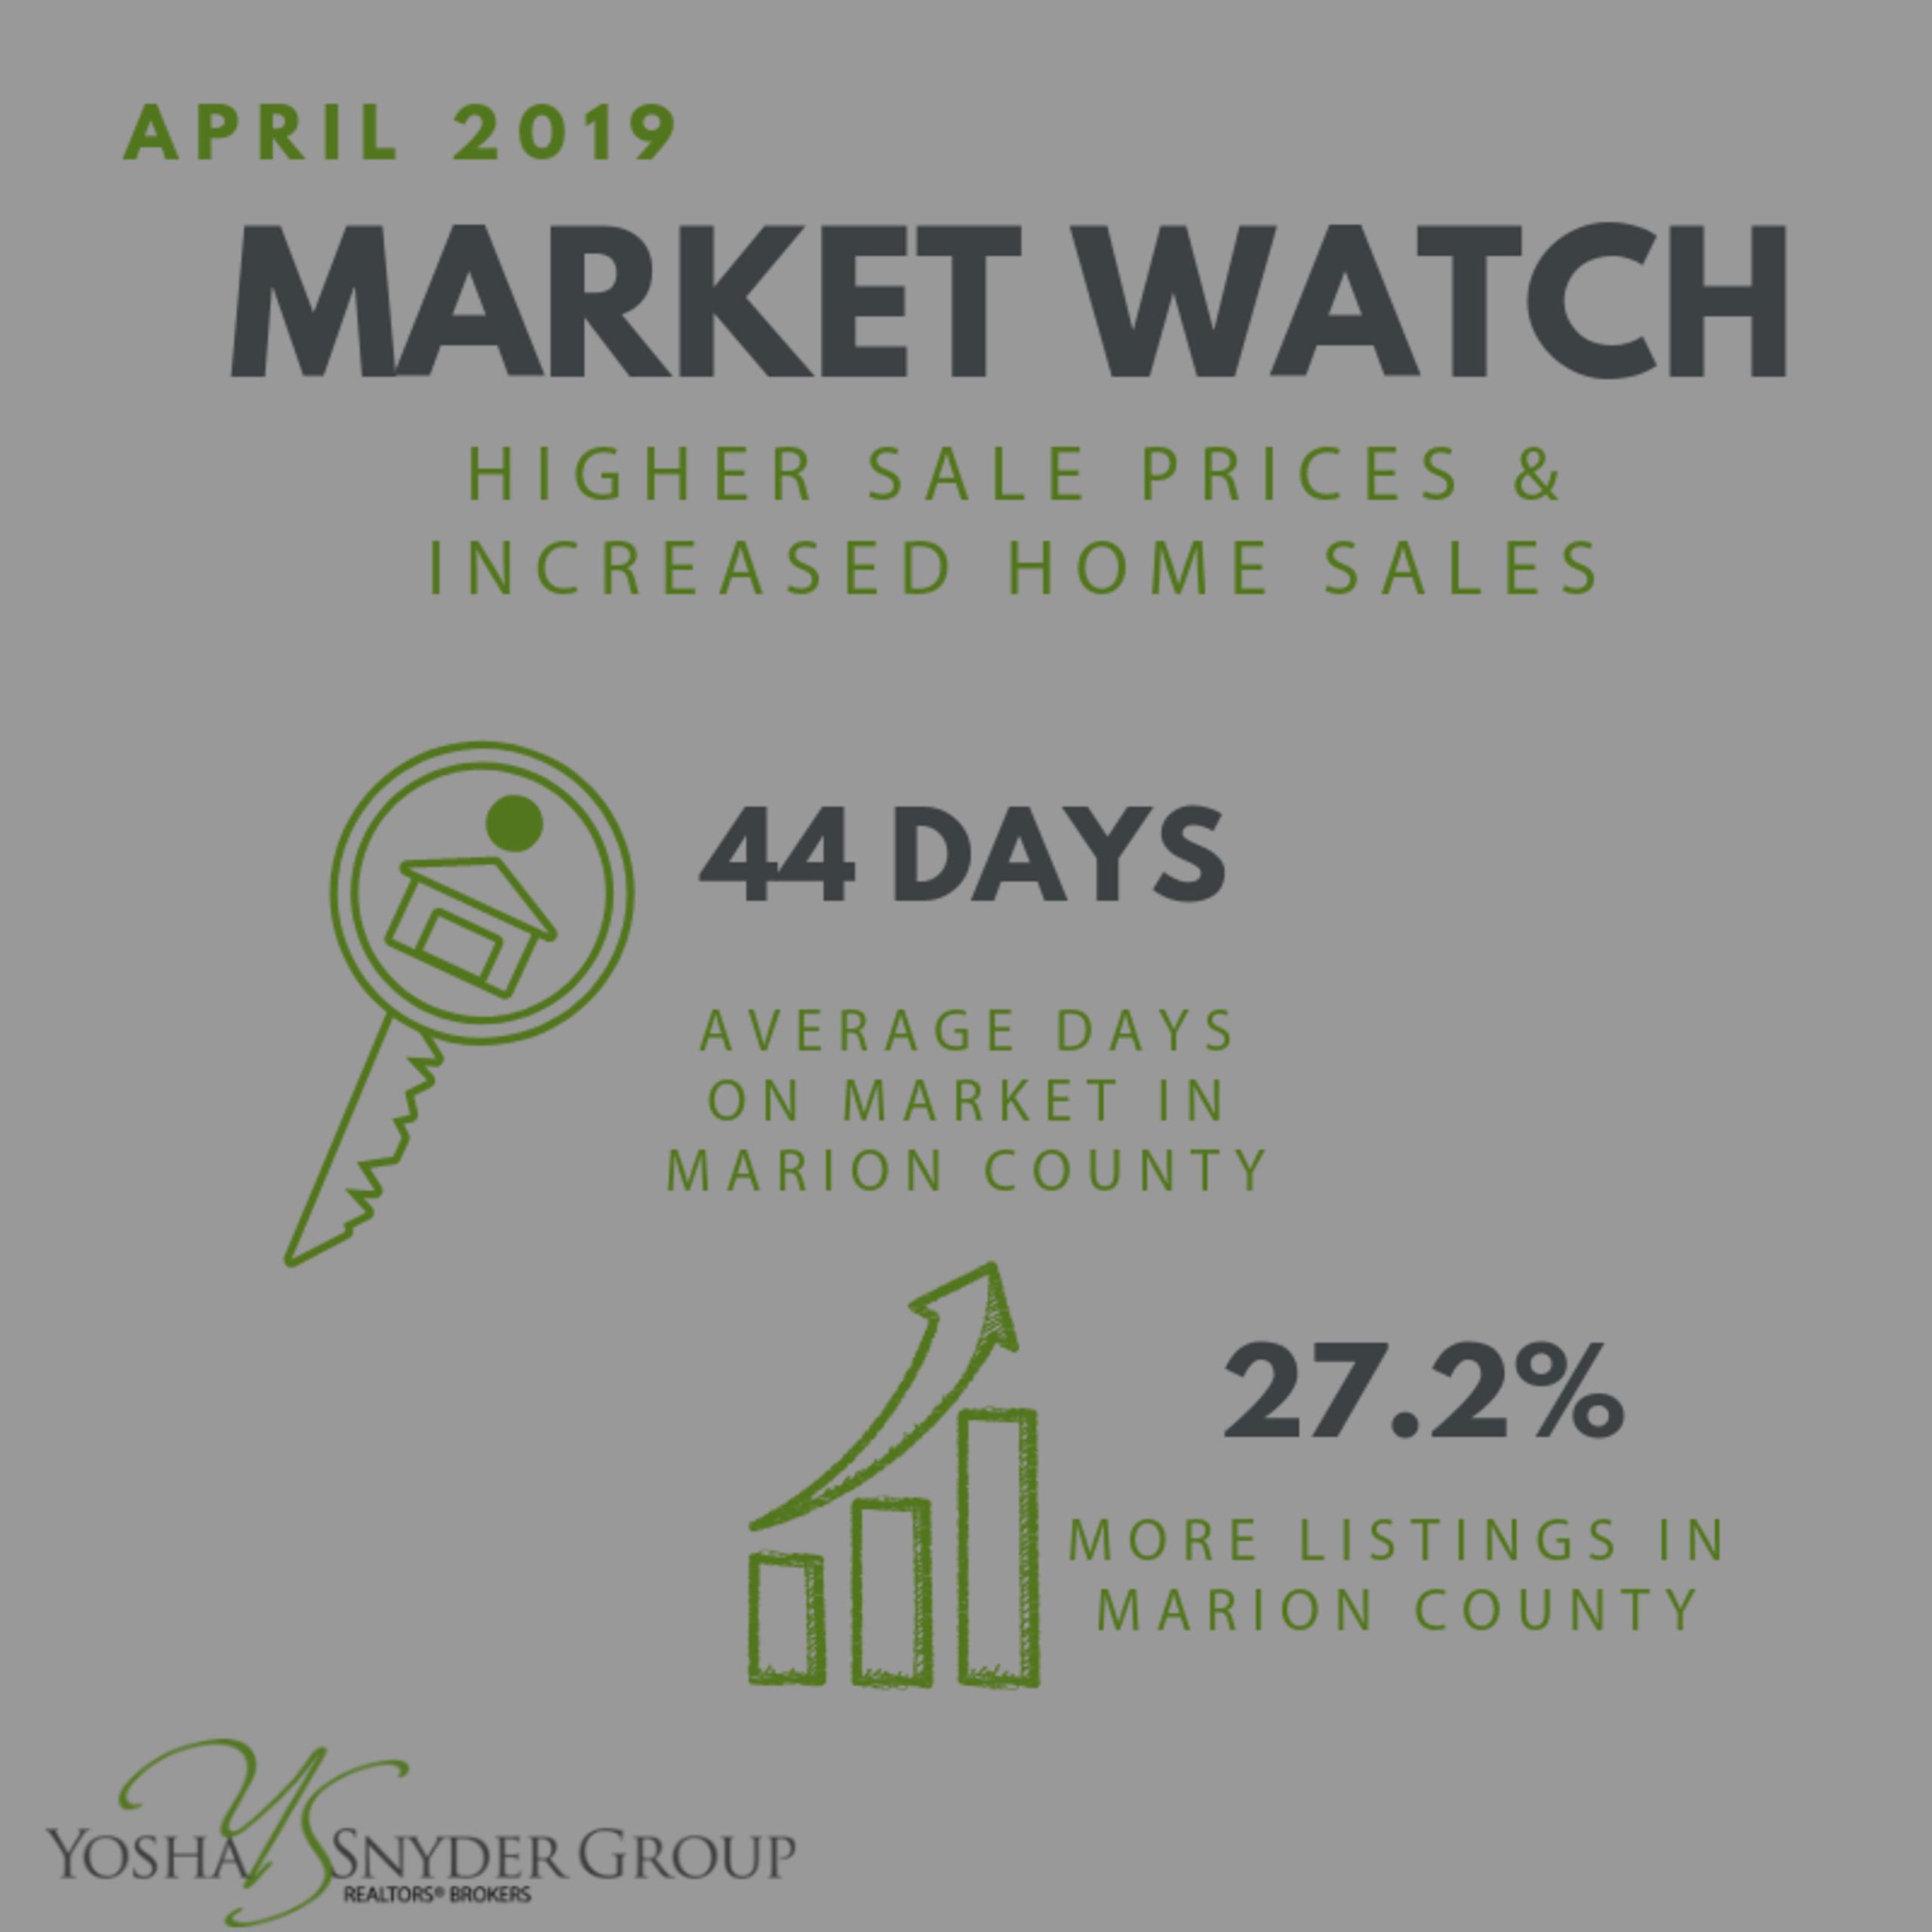 April 2019 Market Watch